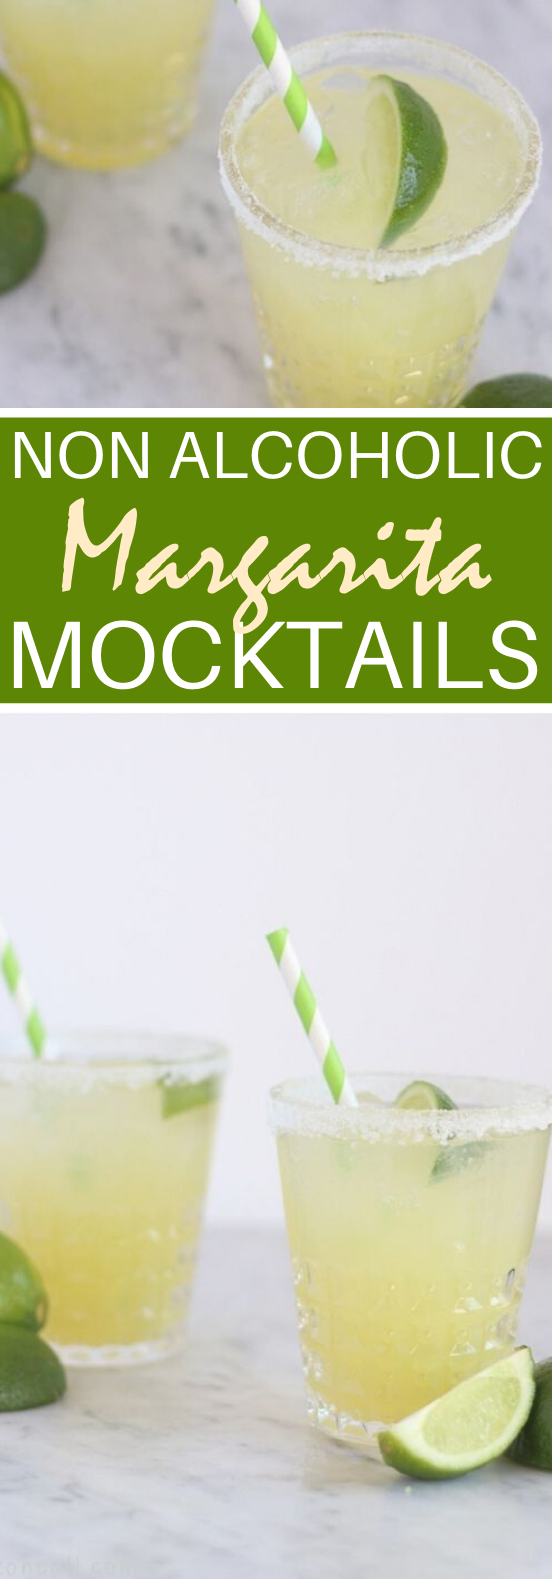 Margarita Mocktail #nonalcohol #drinks #cocktails #refreshing #margarita